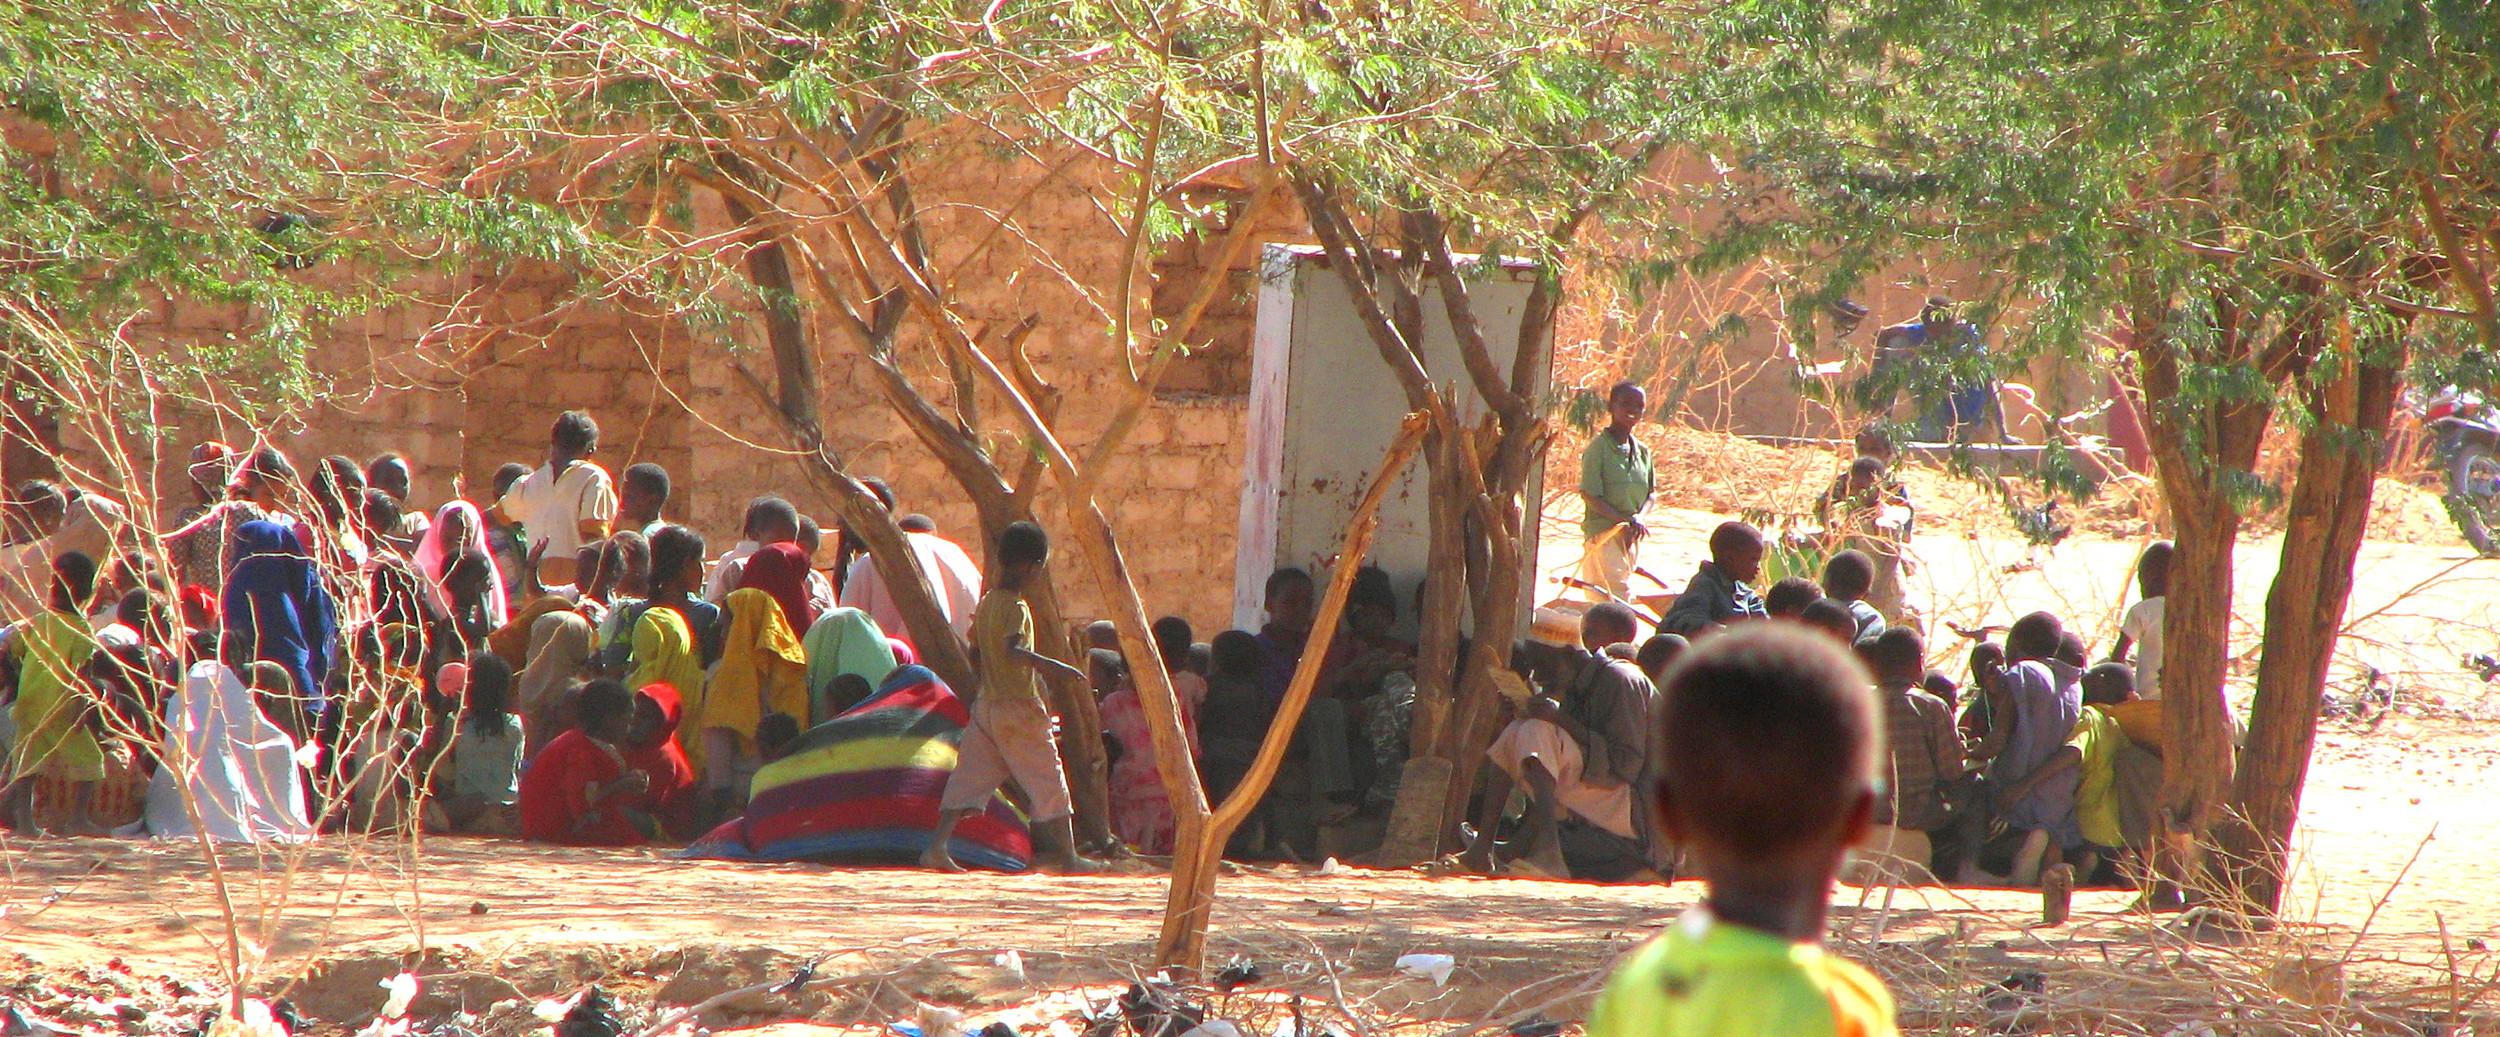 Outdoor Classroom, Agadez, Niger 2007